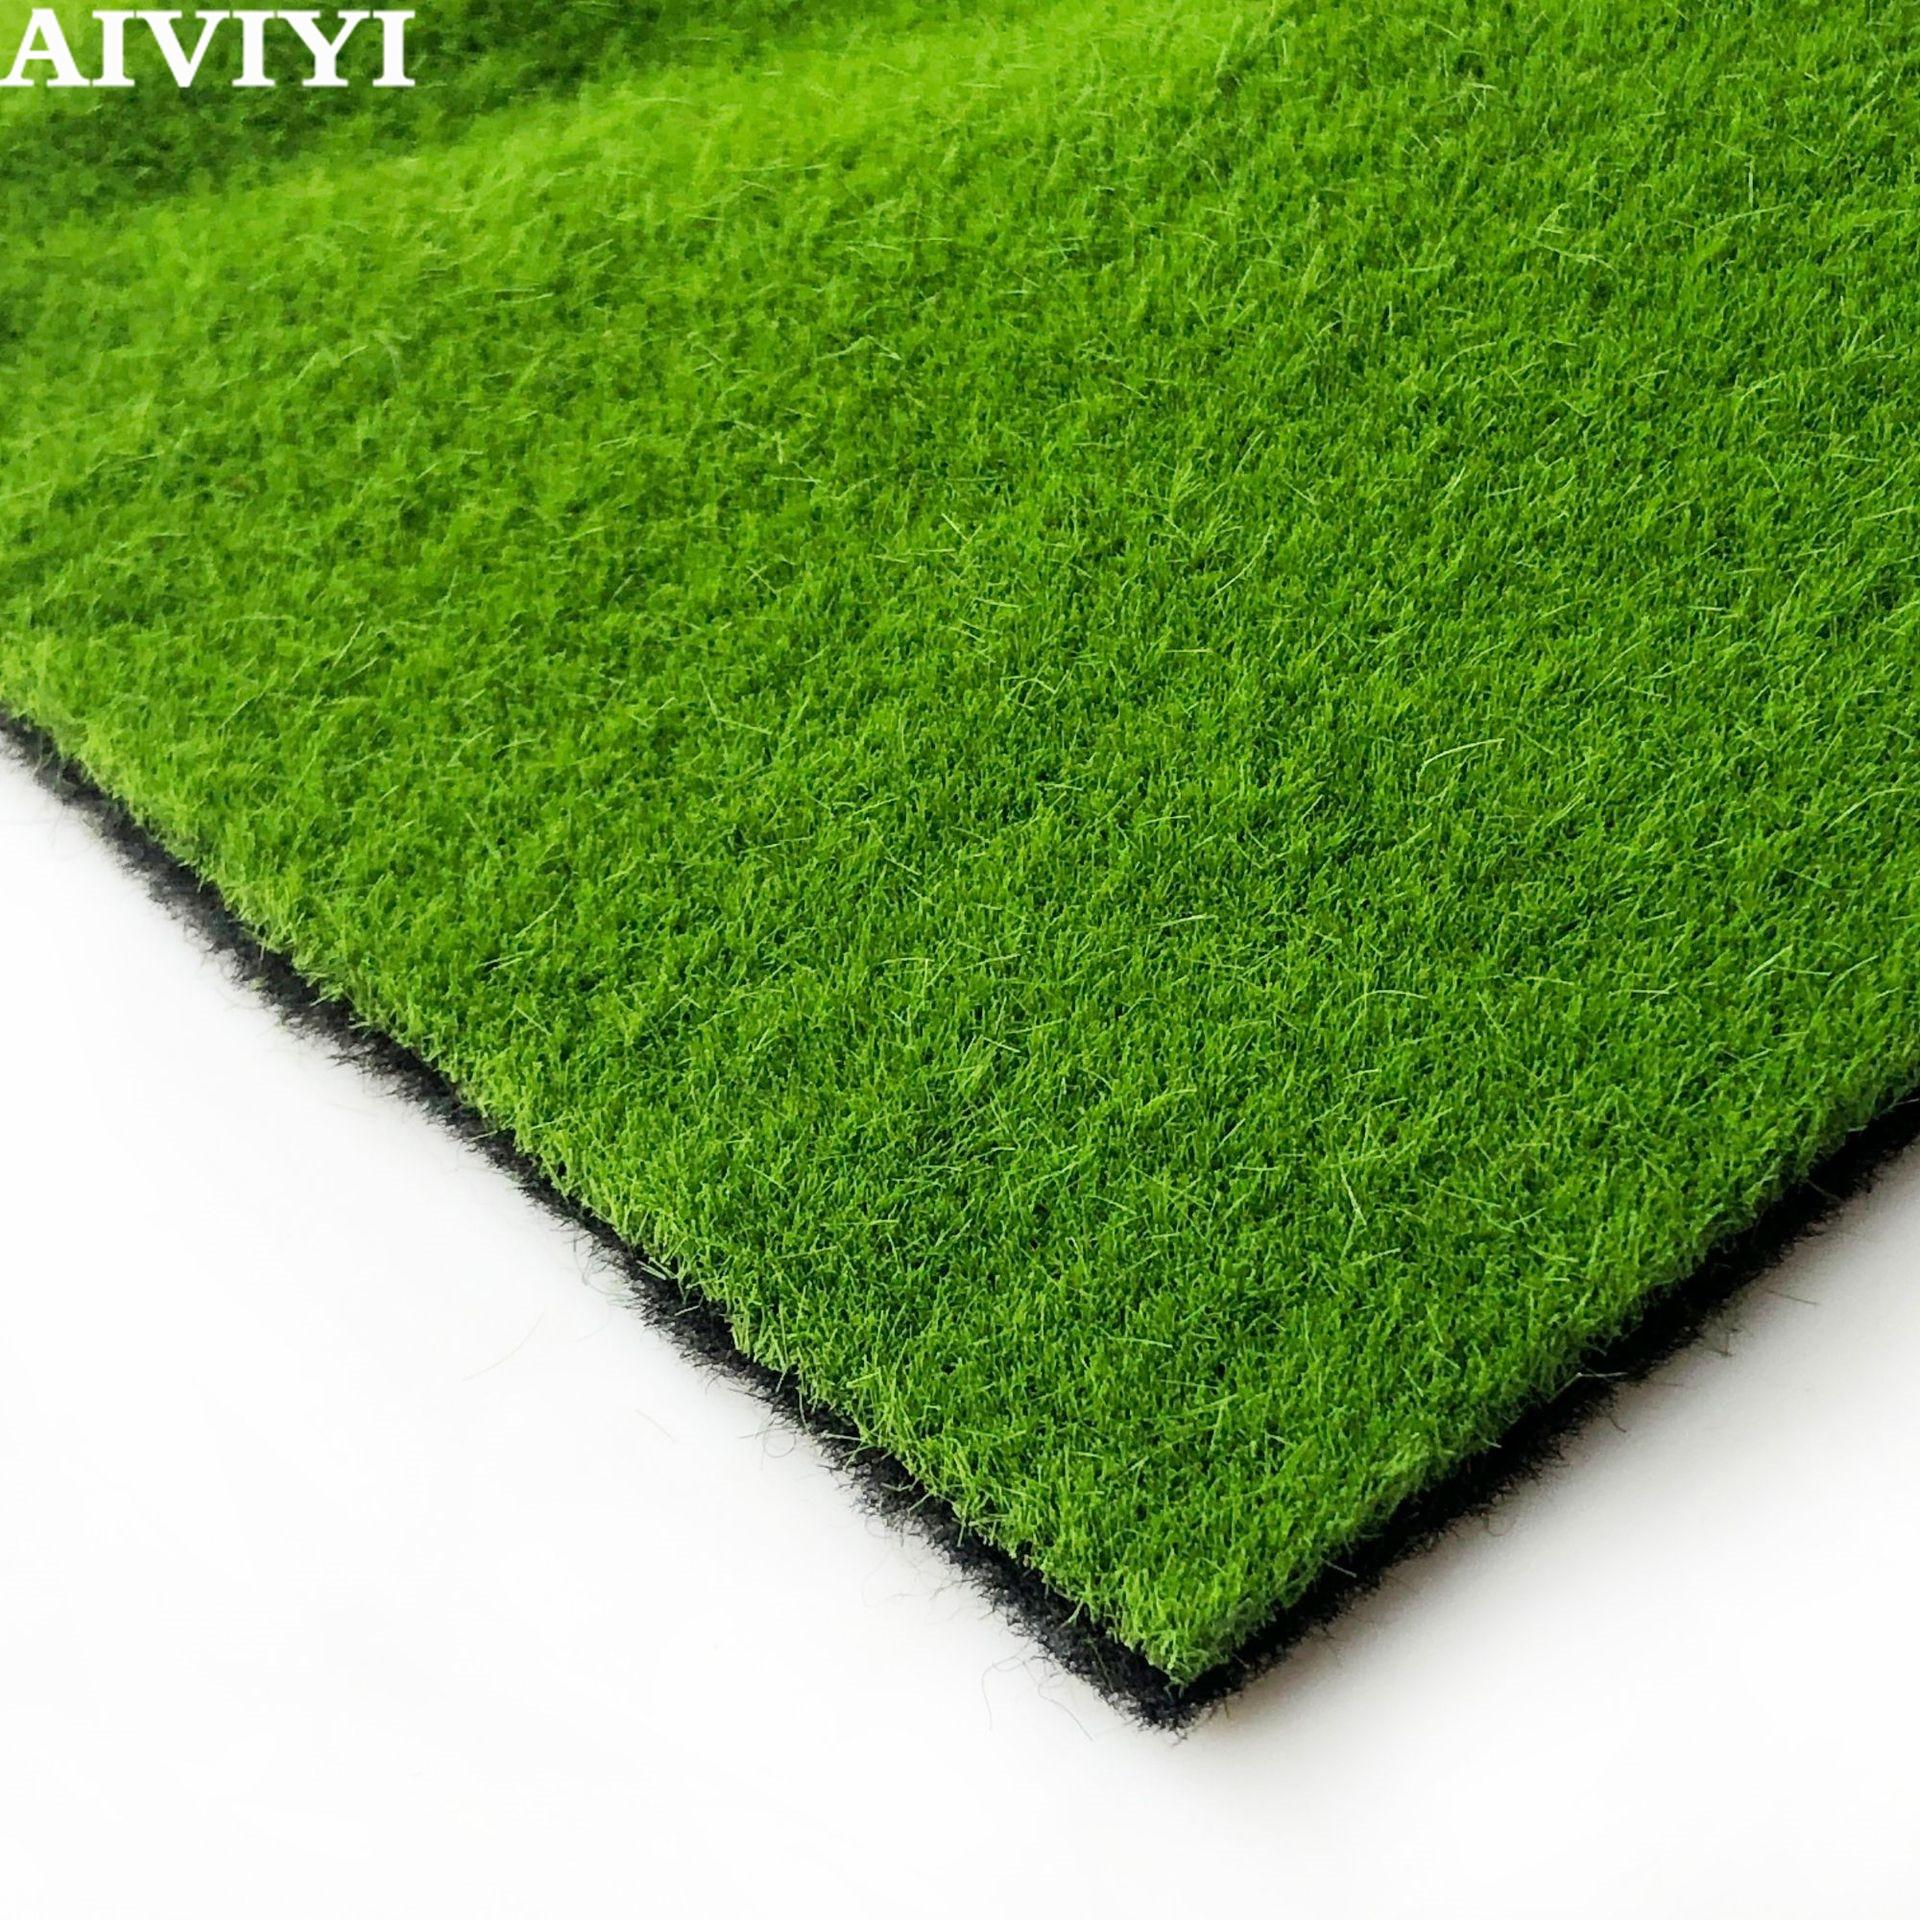 Artificial Moss Lawn Simulation Turf Wall Green Plant DIY Artificial Grass Wedding Mini Garden Micro Eco Bottle Decoration